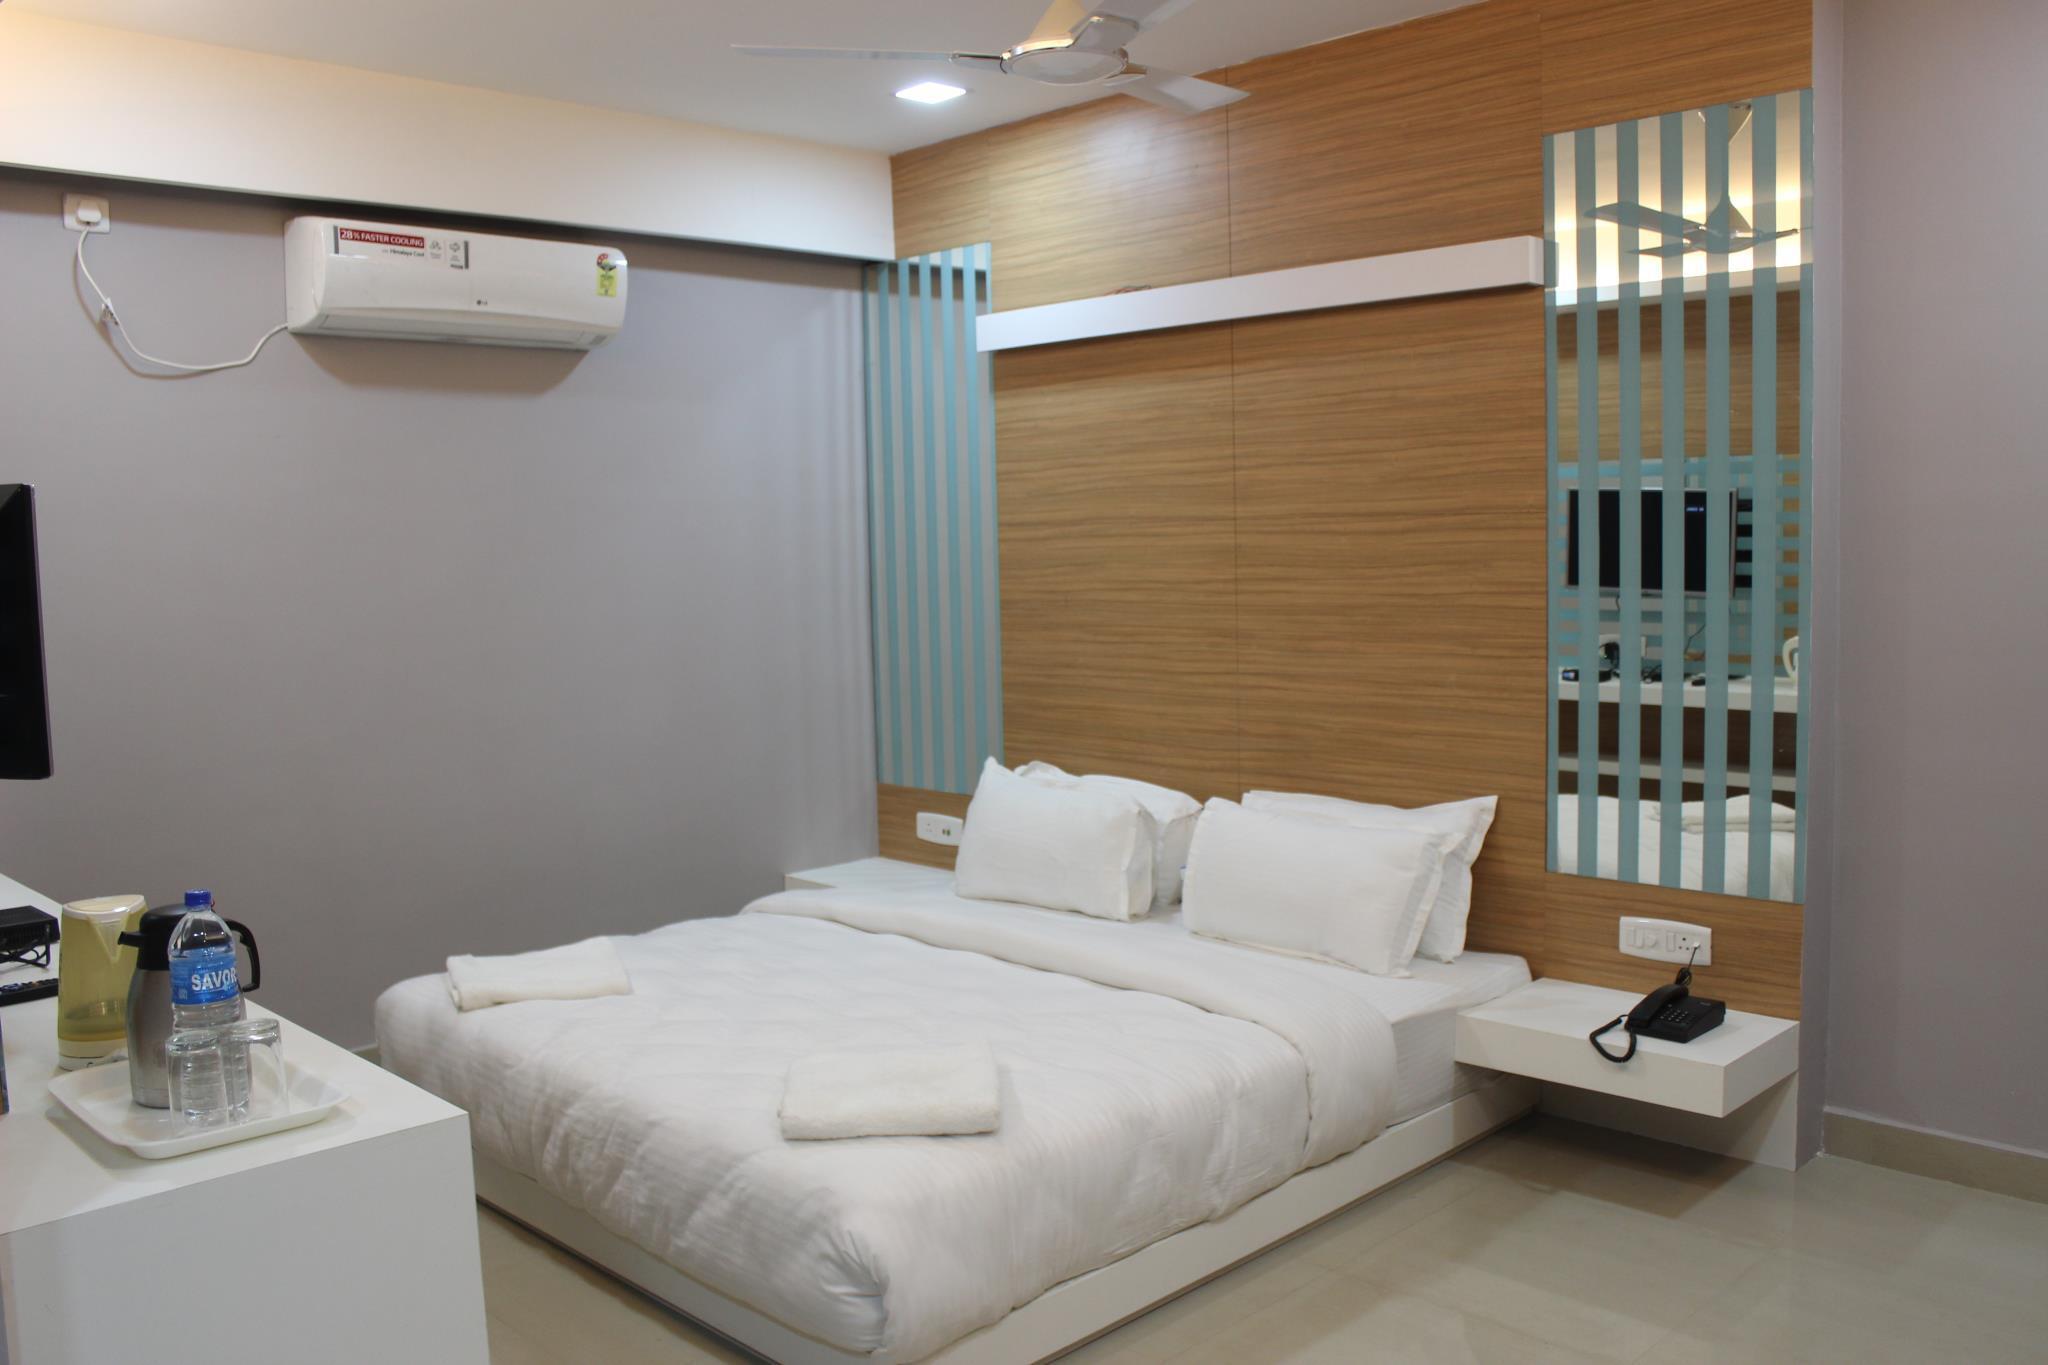 Hotel Nezone  Guwahati  India